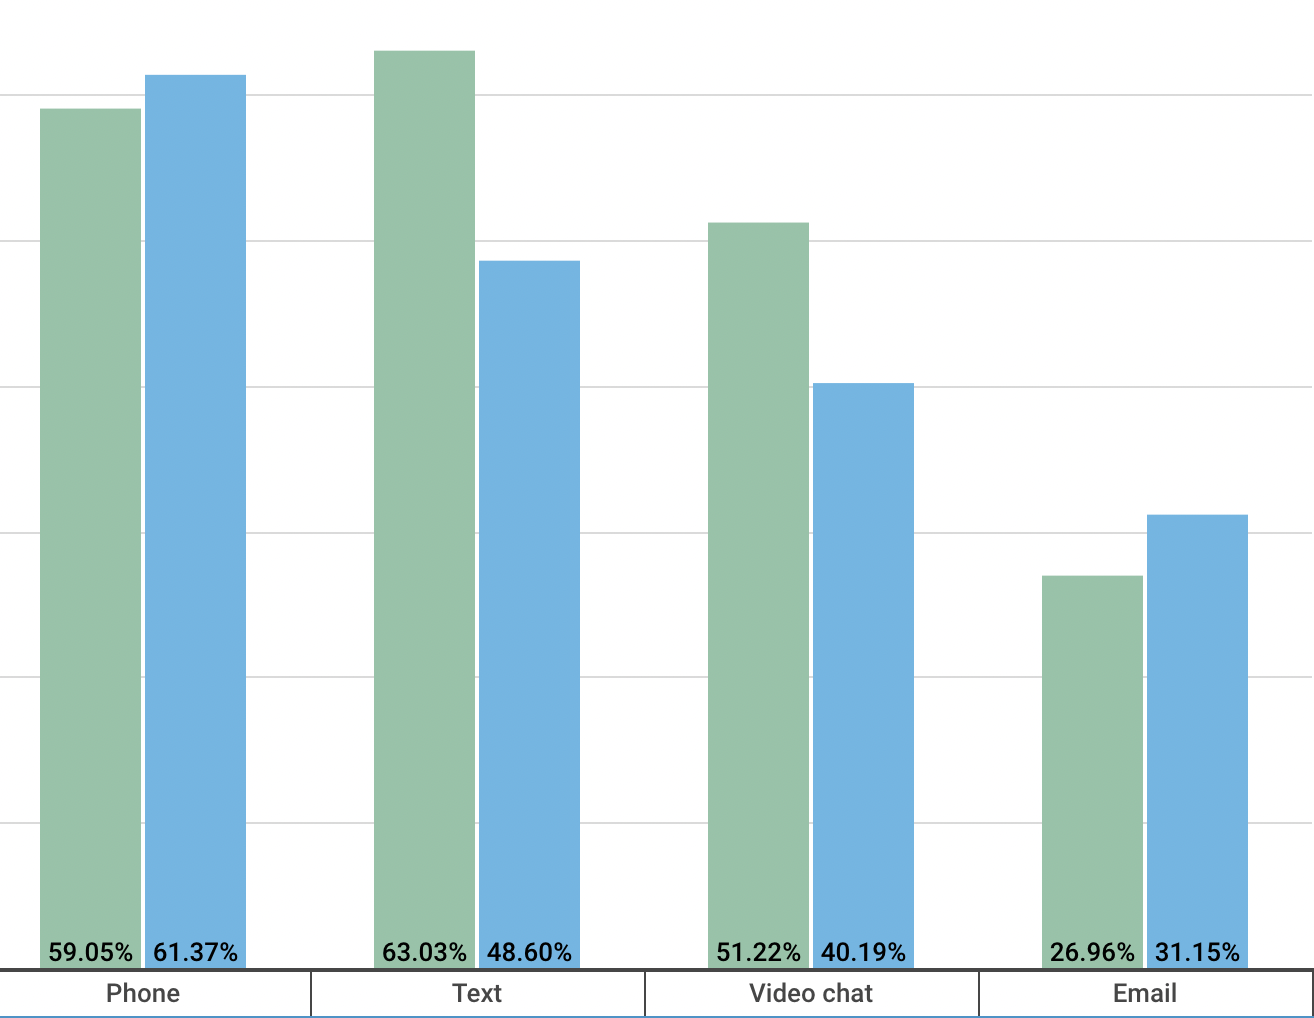 communication preferences statistics 2021